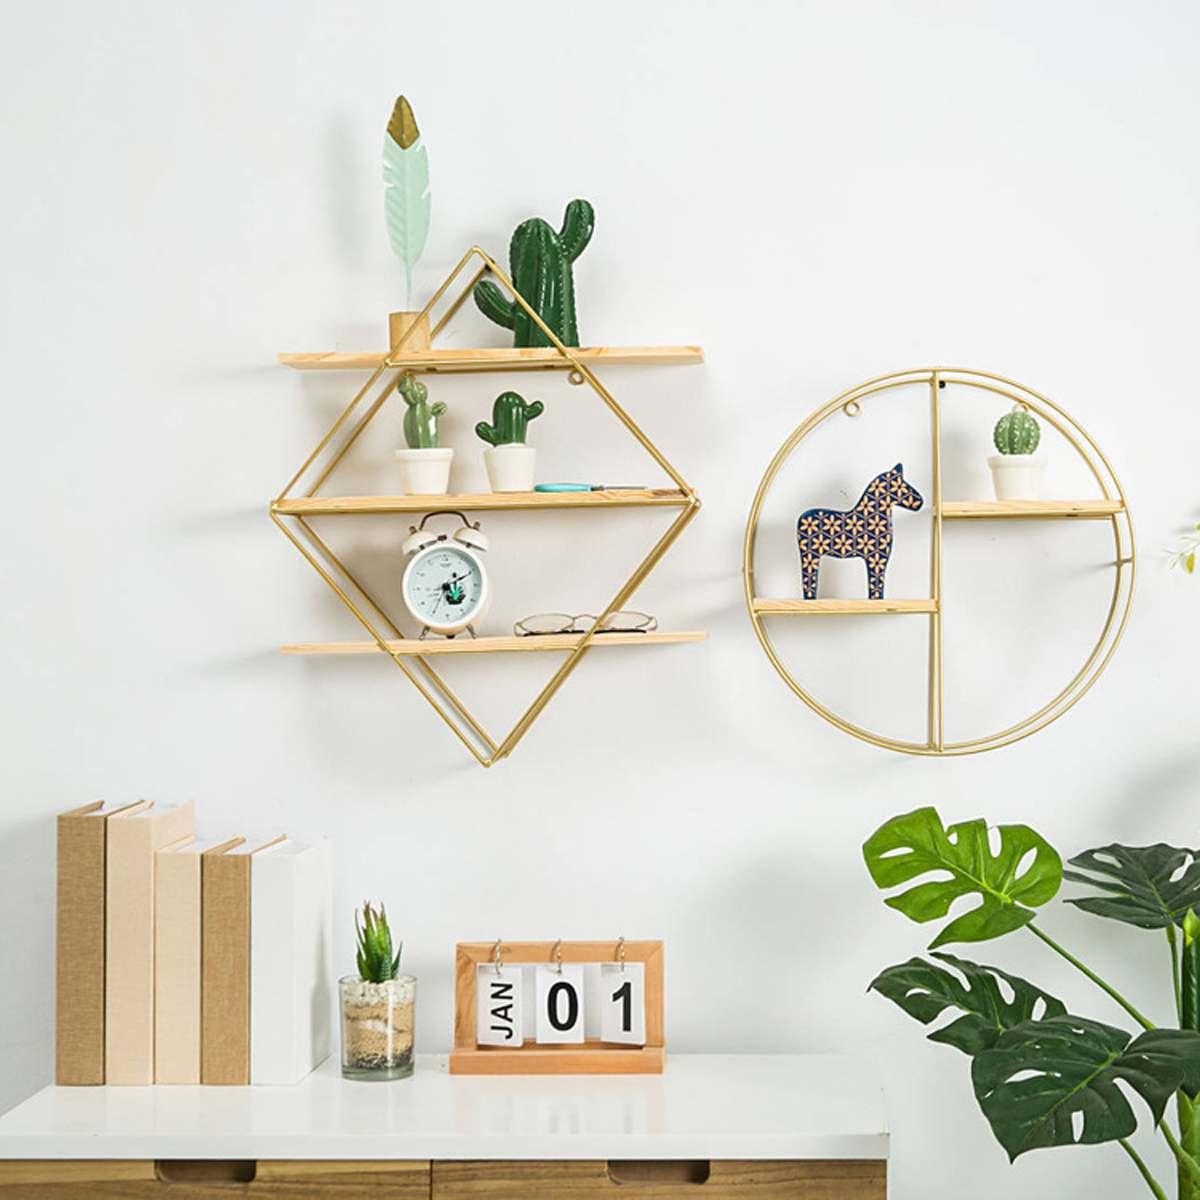 Nordic Metal Wall Shelf Shelves Organization Unit Bookcase Bookshelf Display Hanging Convenient Rack Holder Home Decoration Полка